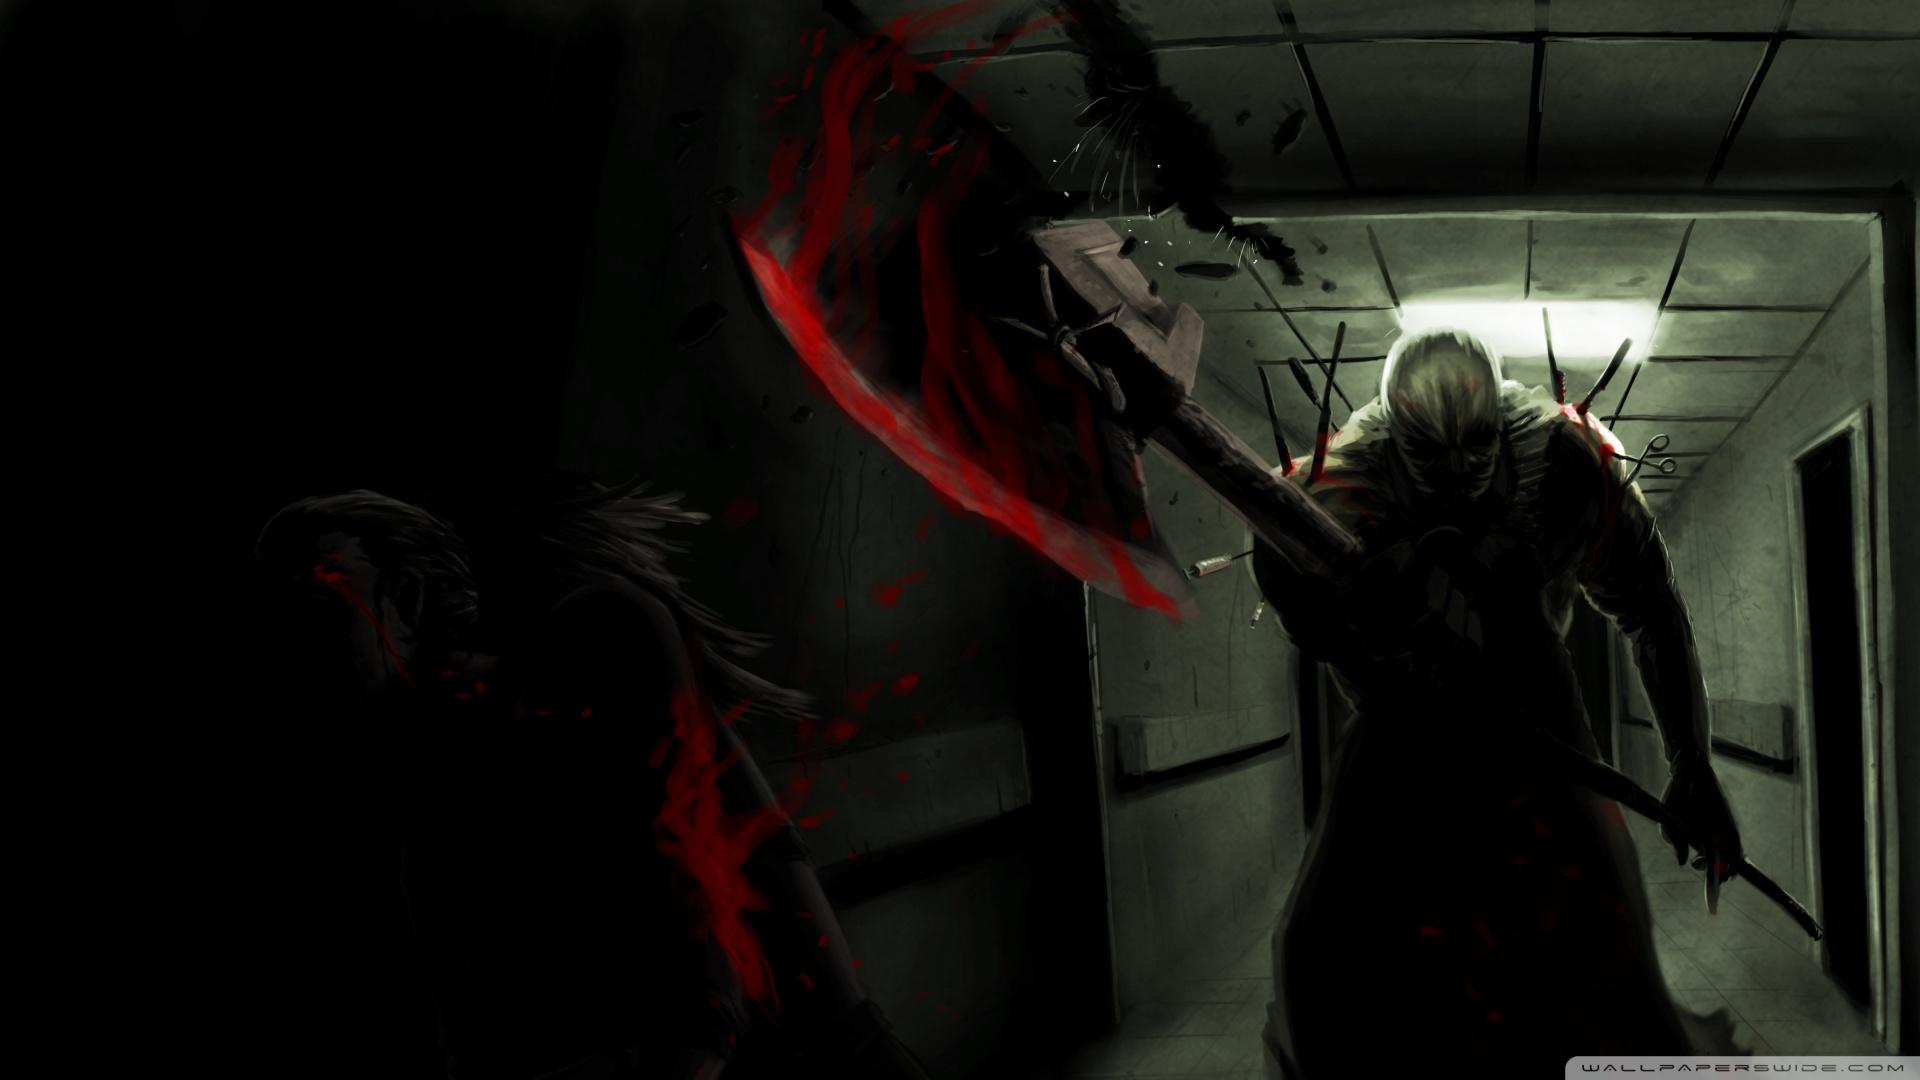 Free Download Resident Evil Afterlife 3 Wallpaper 1920x1080